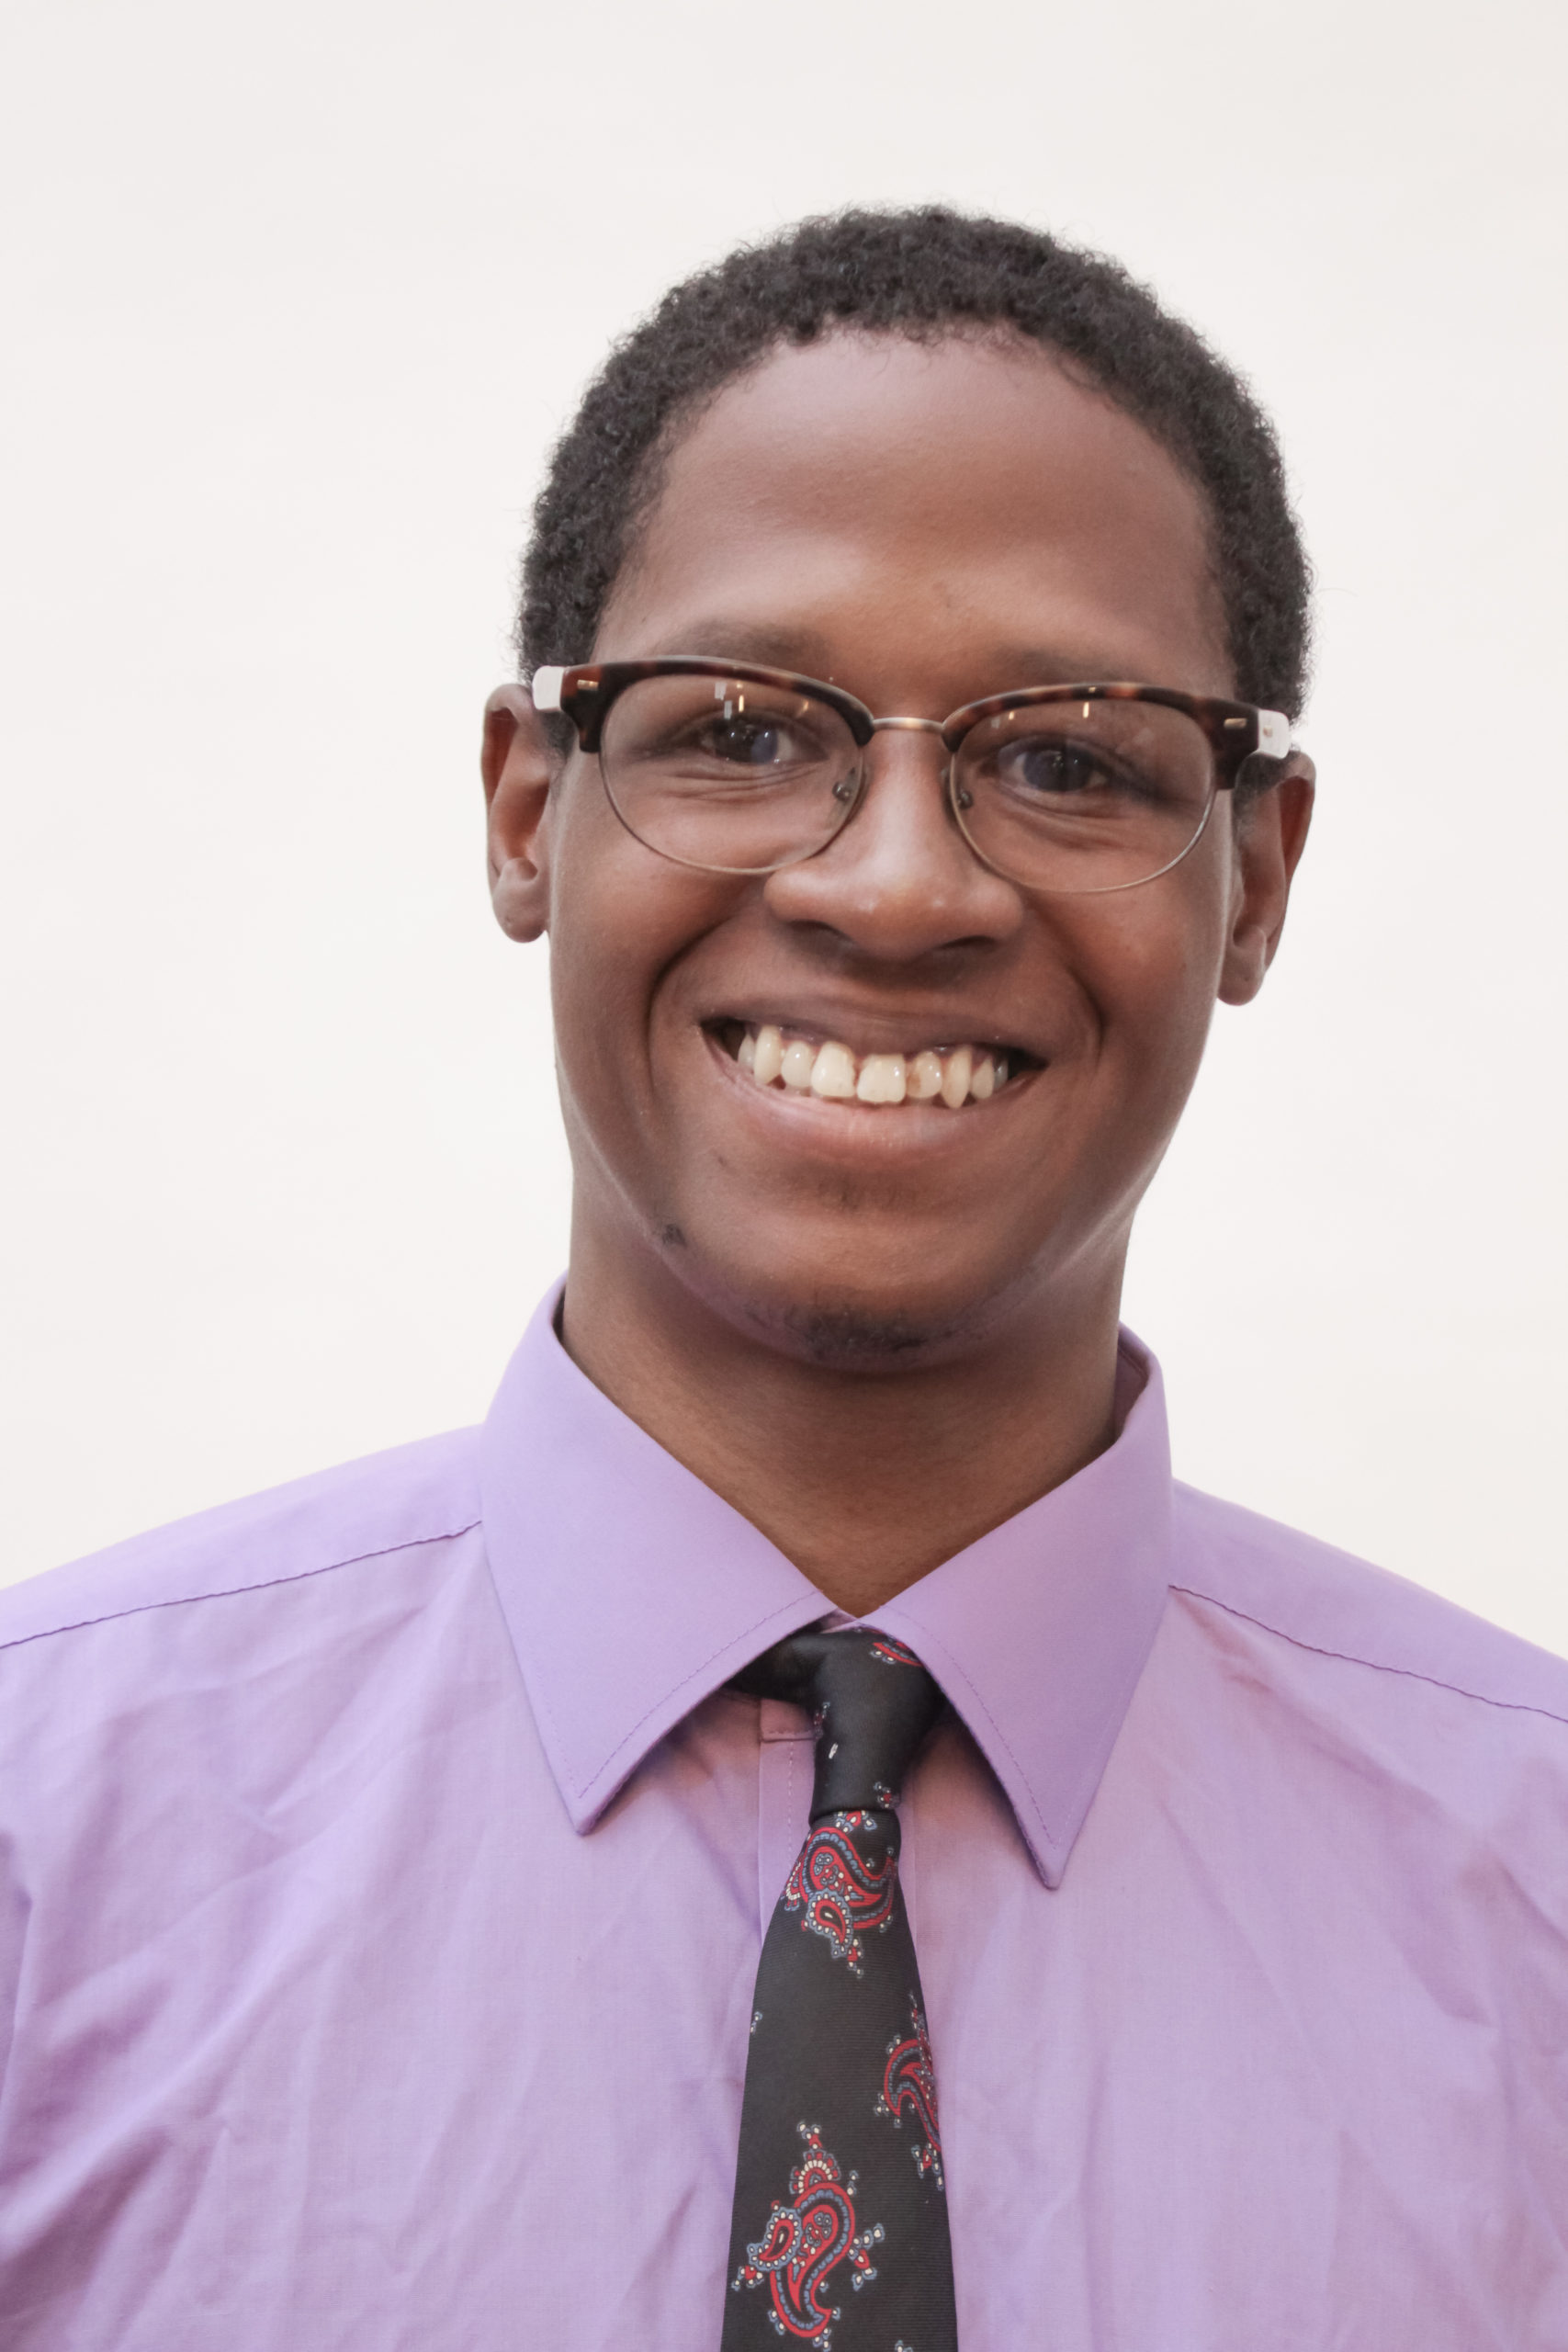 GED Student Highlight: Reggie